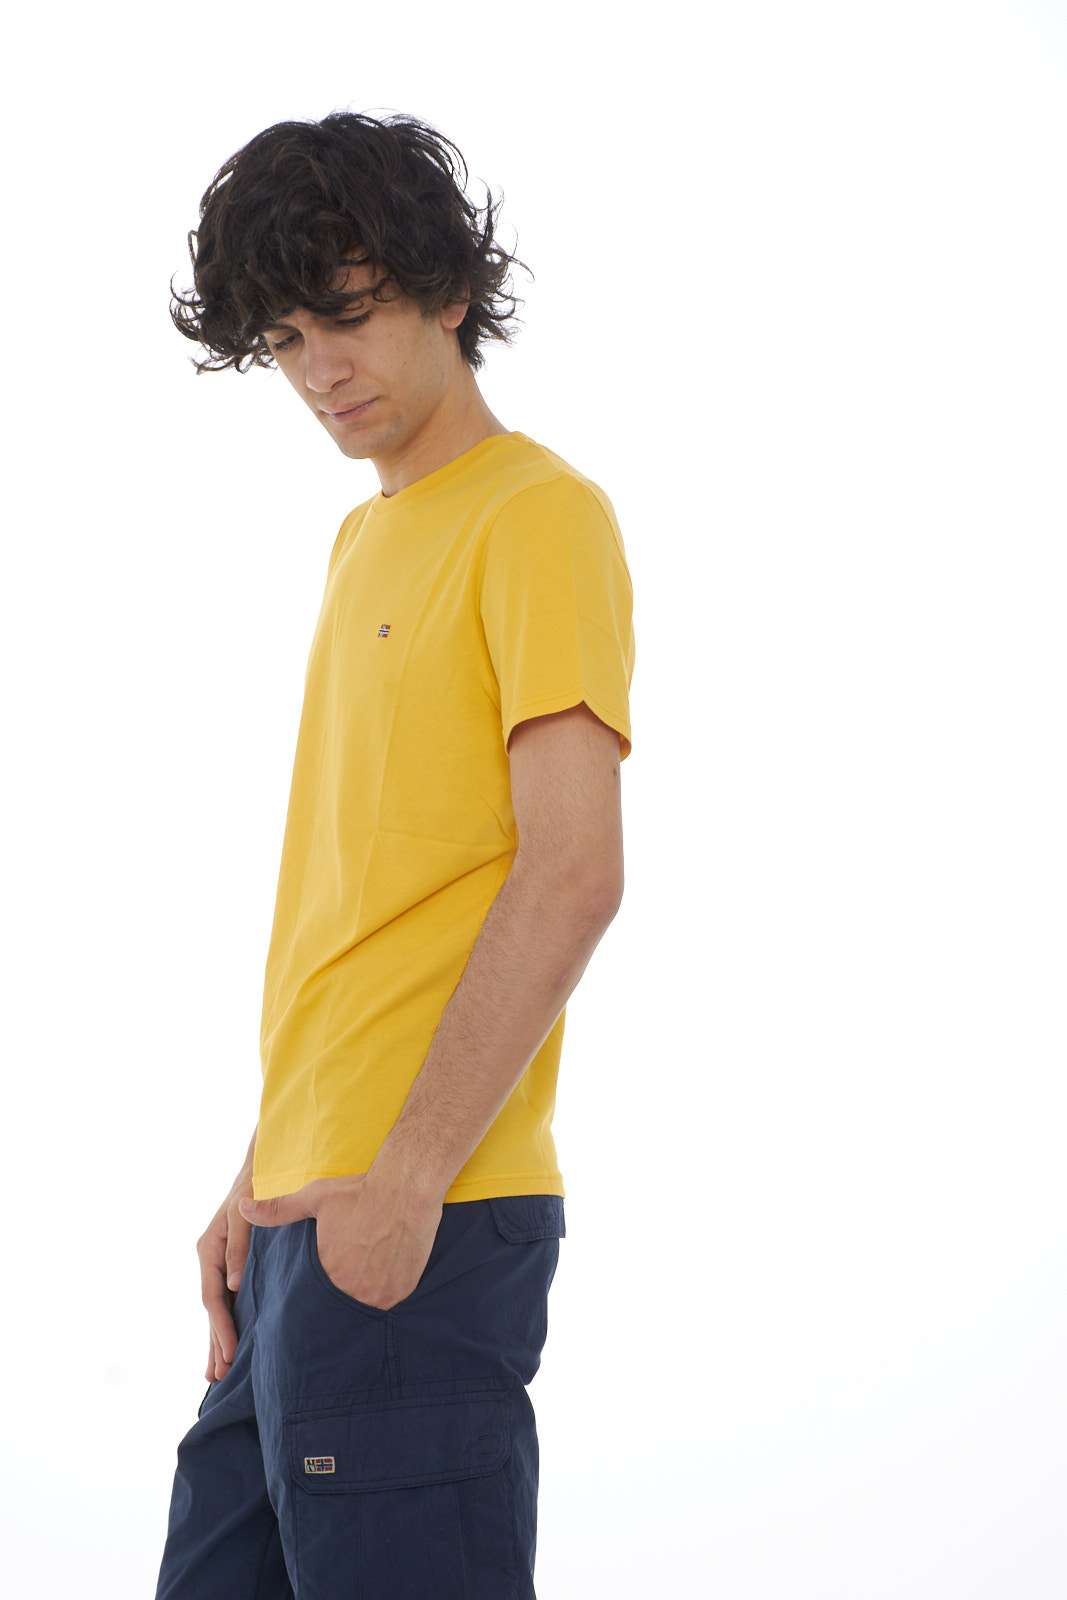 https://www.parmax.com/media/catalog/product/a/i/PE-outlet_parmax-t-shirt-uomo-Napapijri-N0YJAY-B.jpg